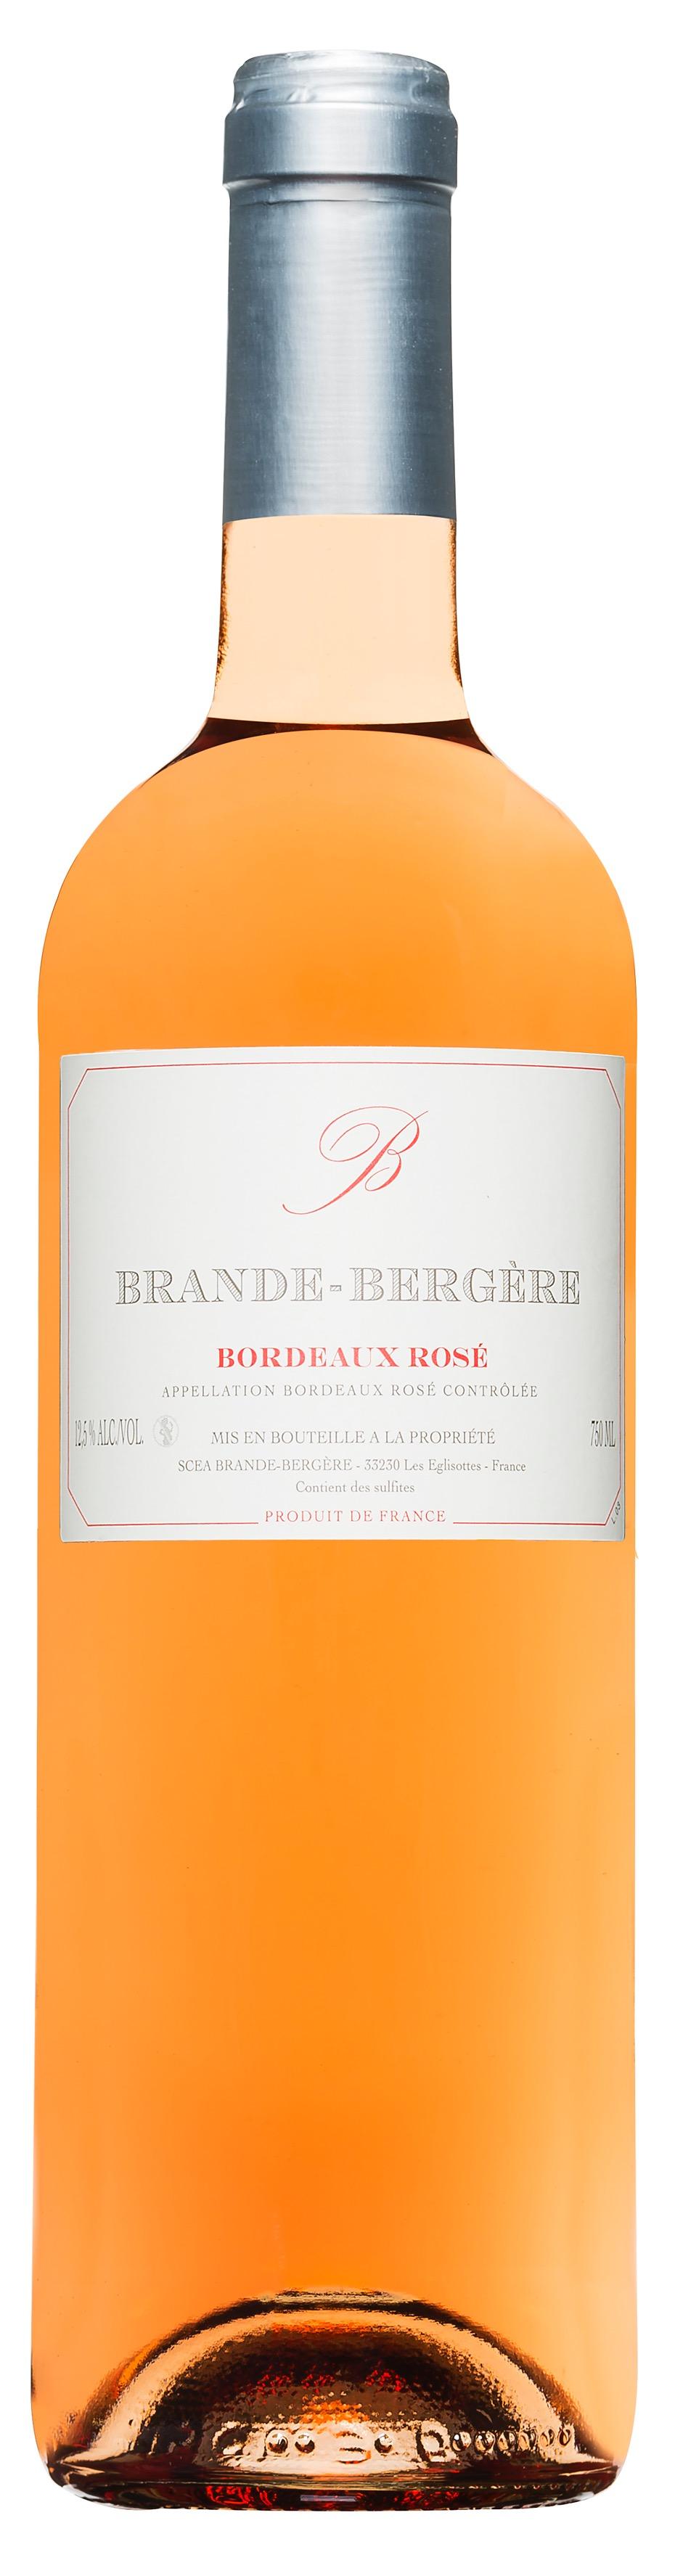 Chateau-Brande-Bergere-rose.jpg